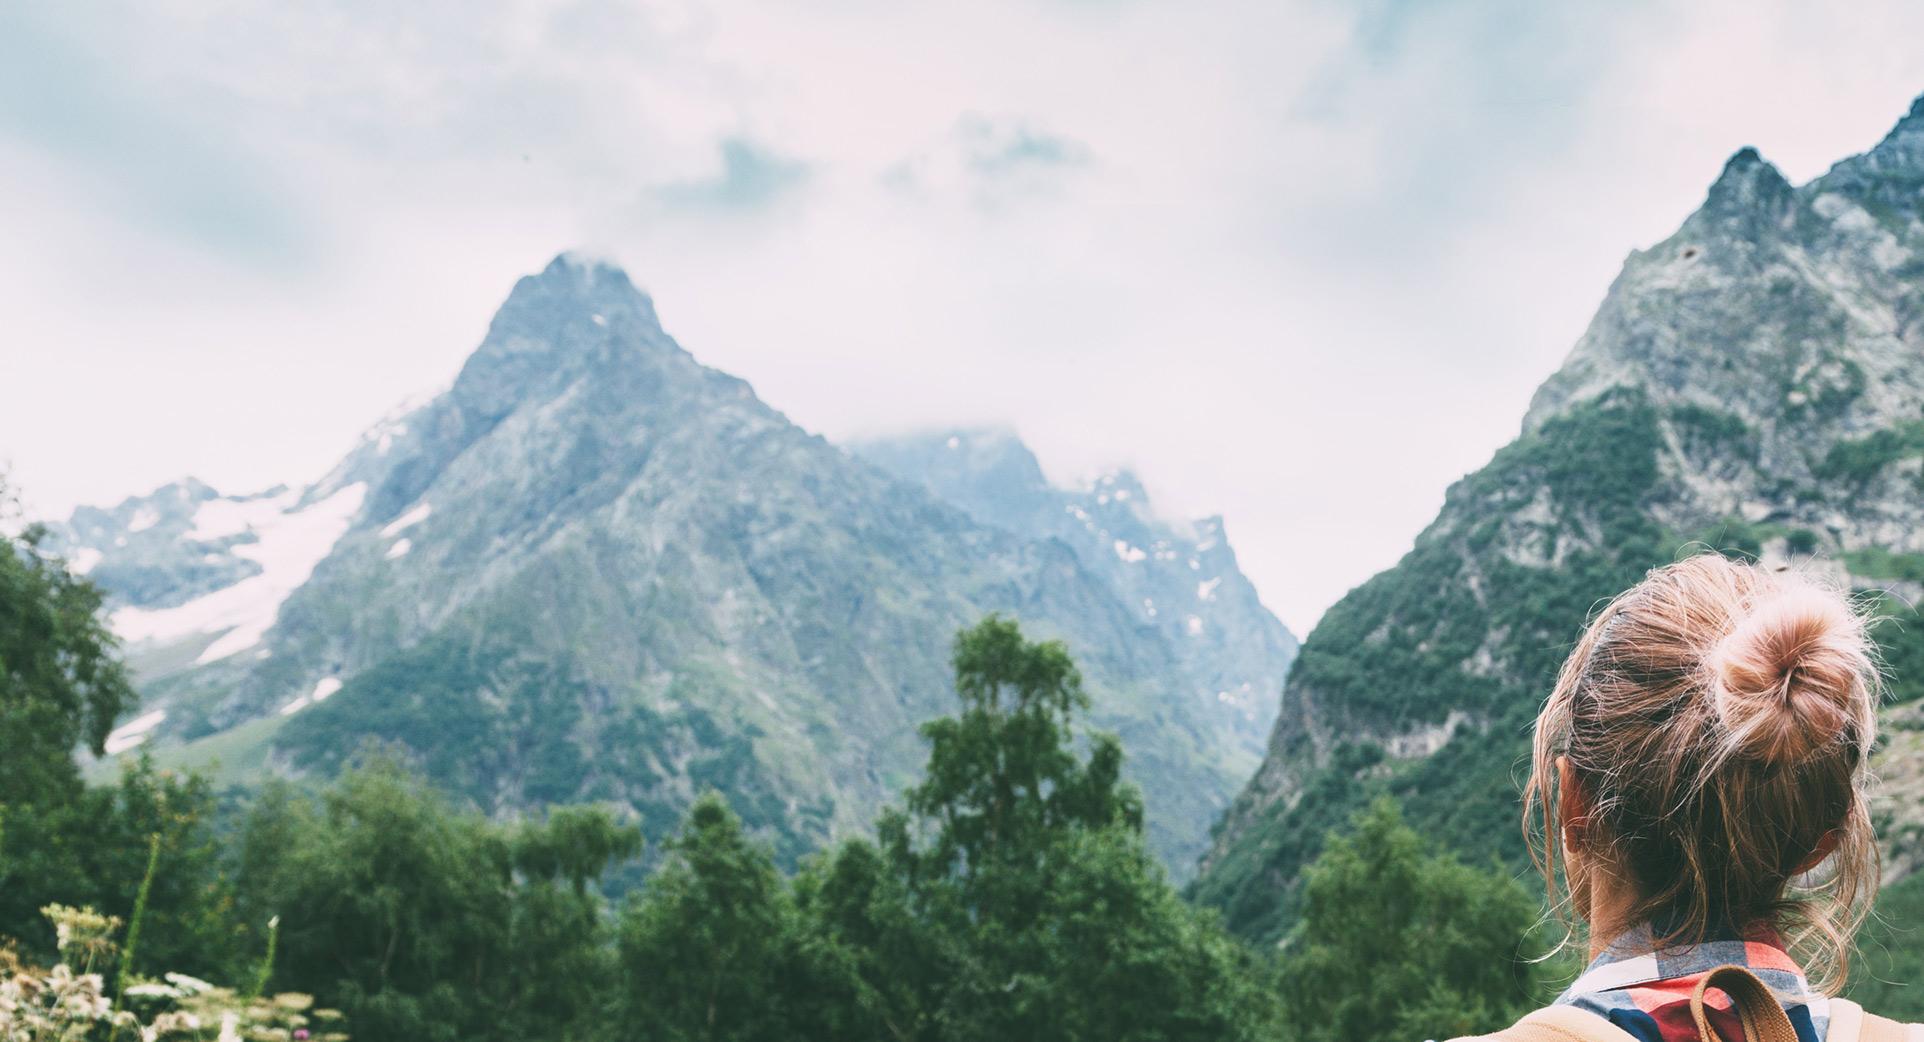 Facing Mountains